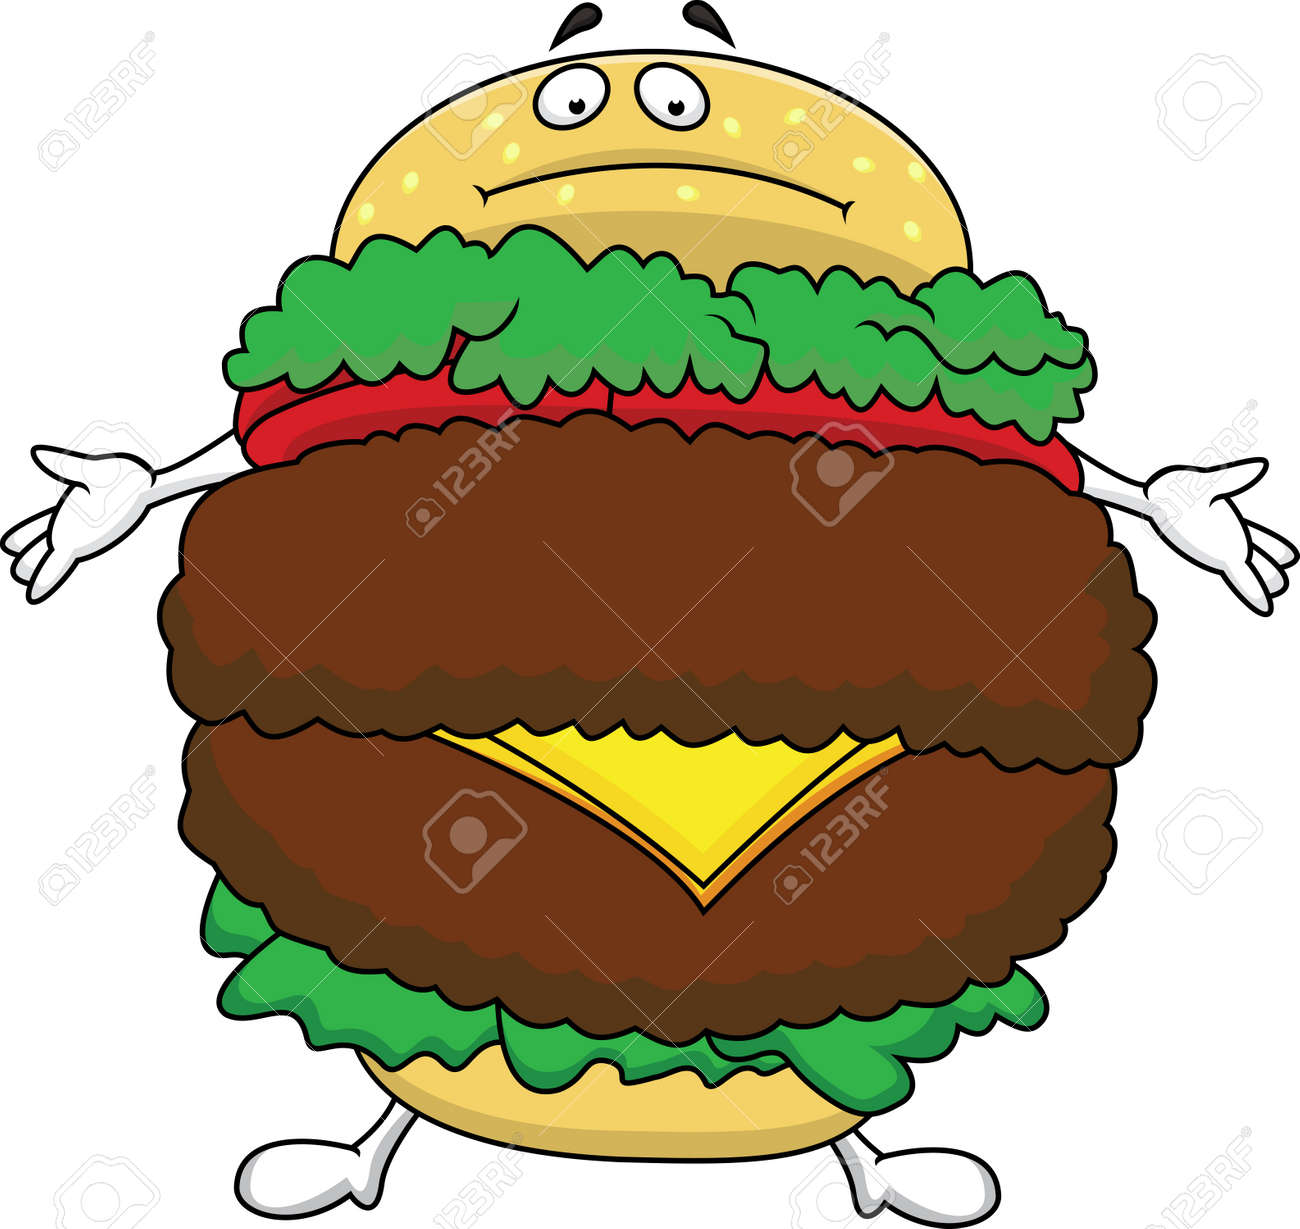 Fat burger cartoon character - 14662186